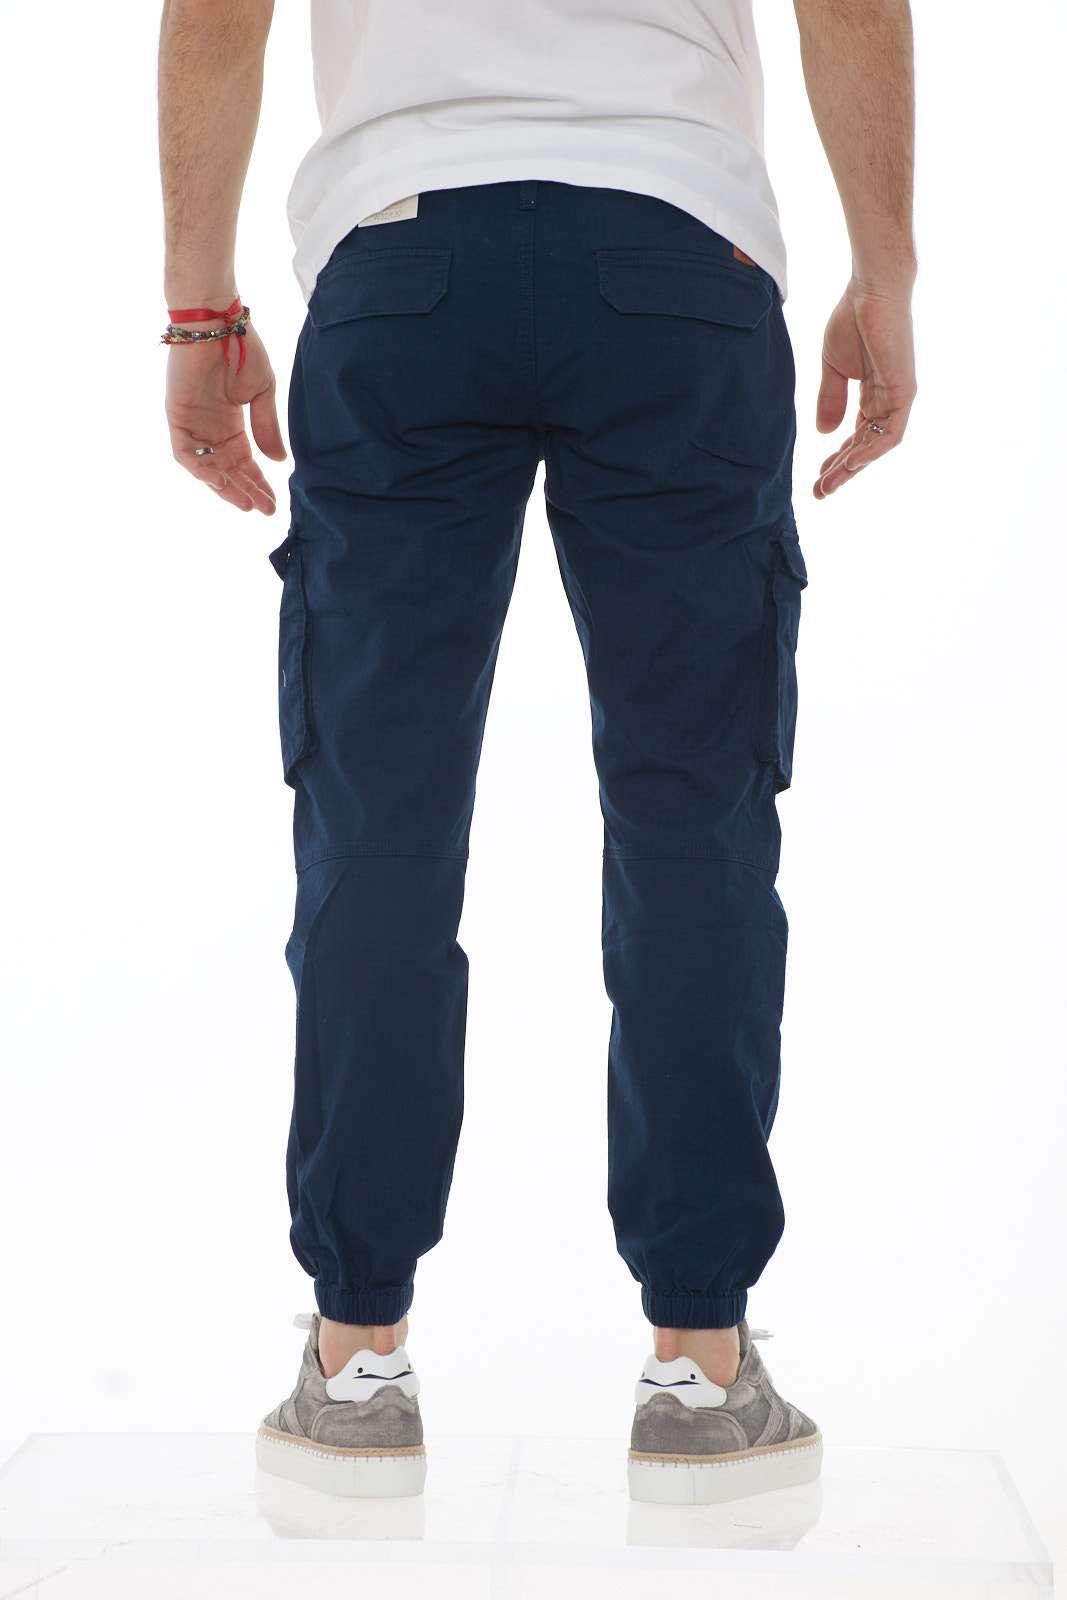 https://www.parmax.com/media/catalog/product/a/i/PE-outlet_parmax-pantaloni-uomo-Timberland-TB%200A1OBC-C.jpg